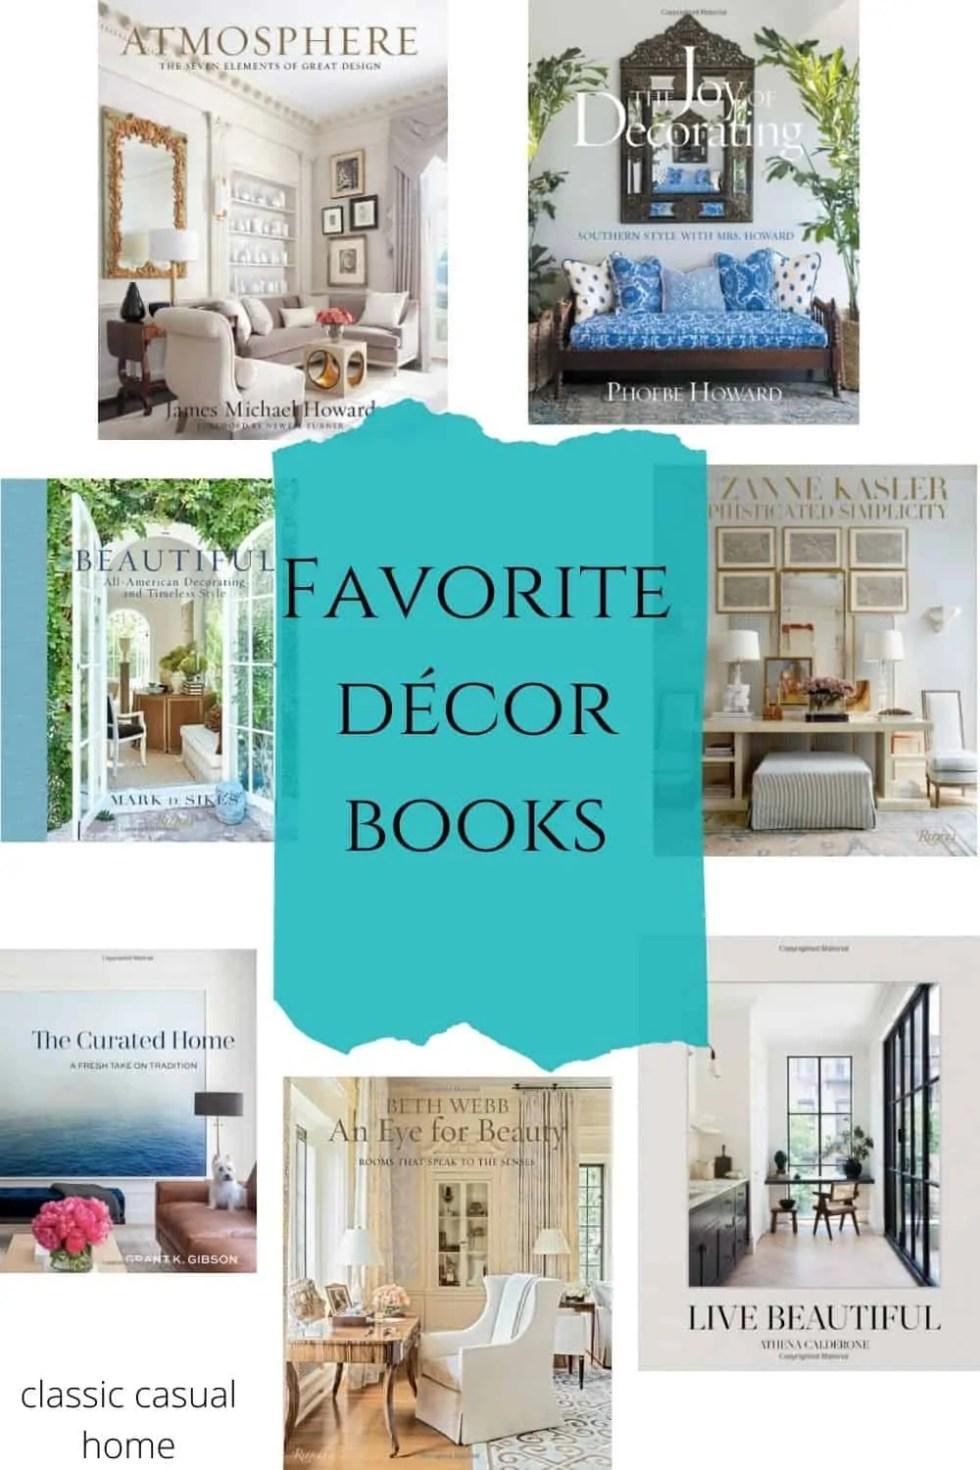 Mary Ann Pickett's Favorite Decor Books